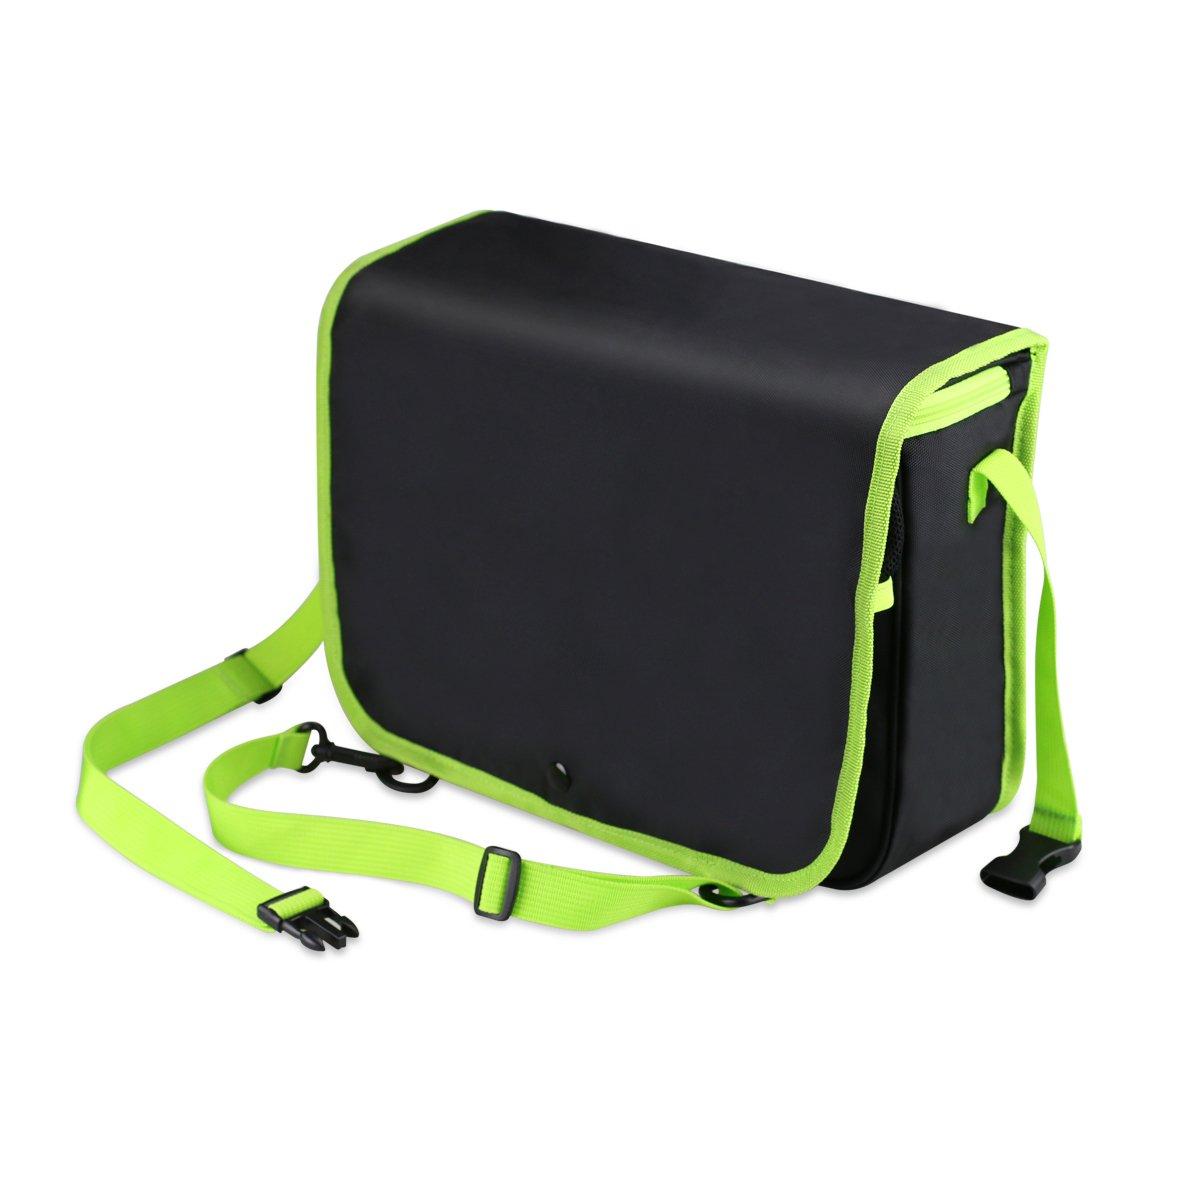 Car Storage Bag Backseat Organiser, Car Ice Bag for picnic and travel Ldex